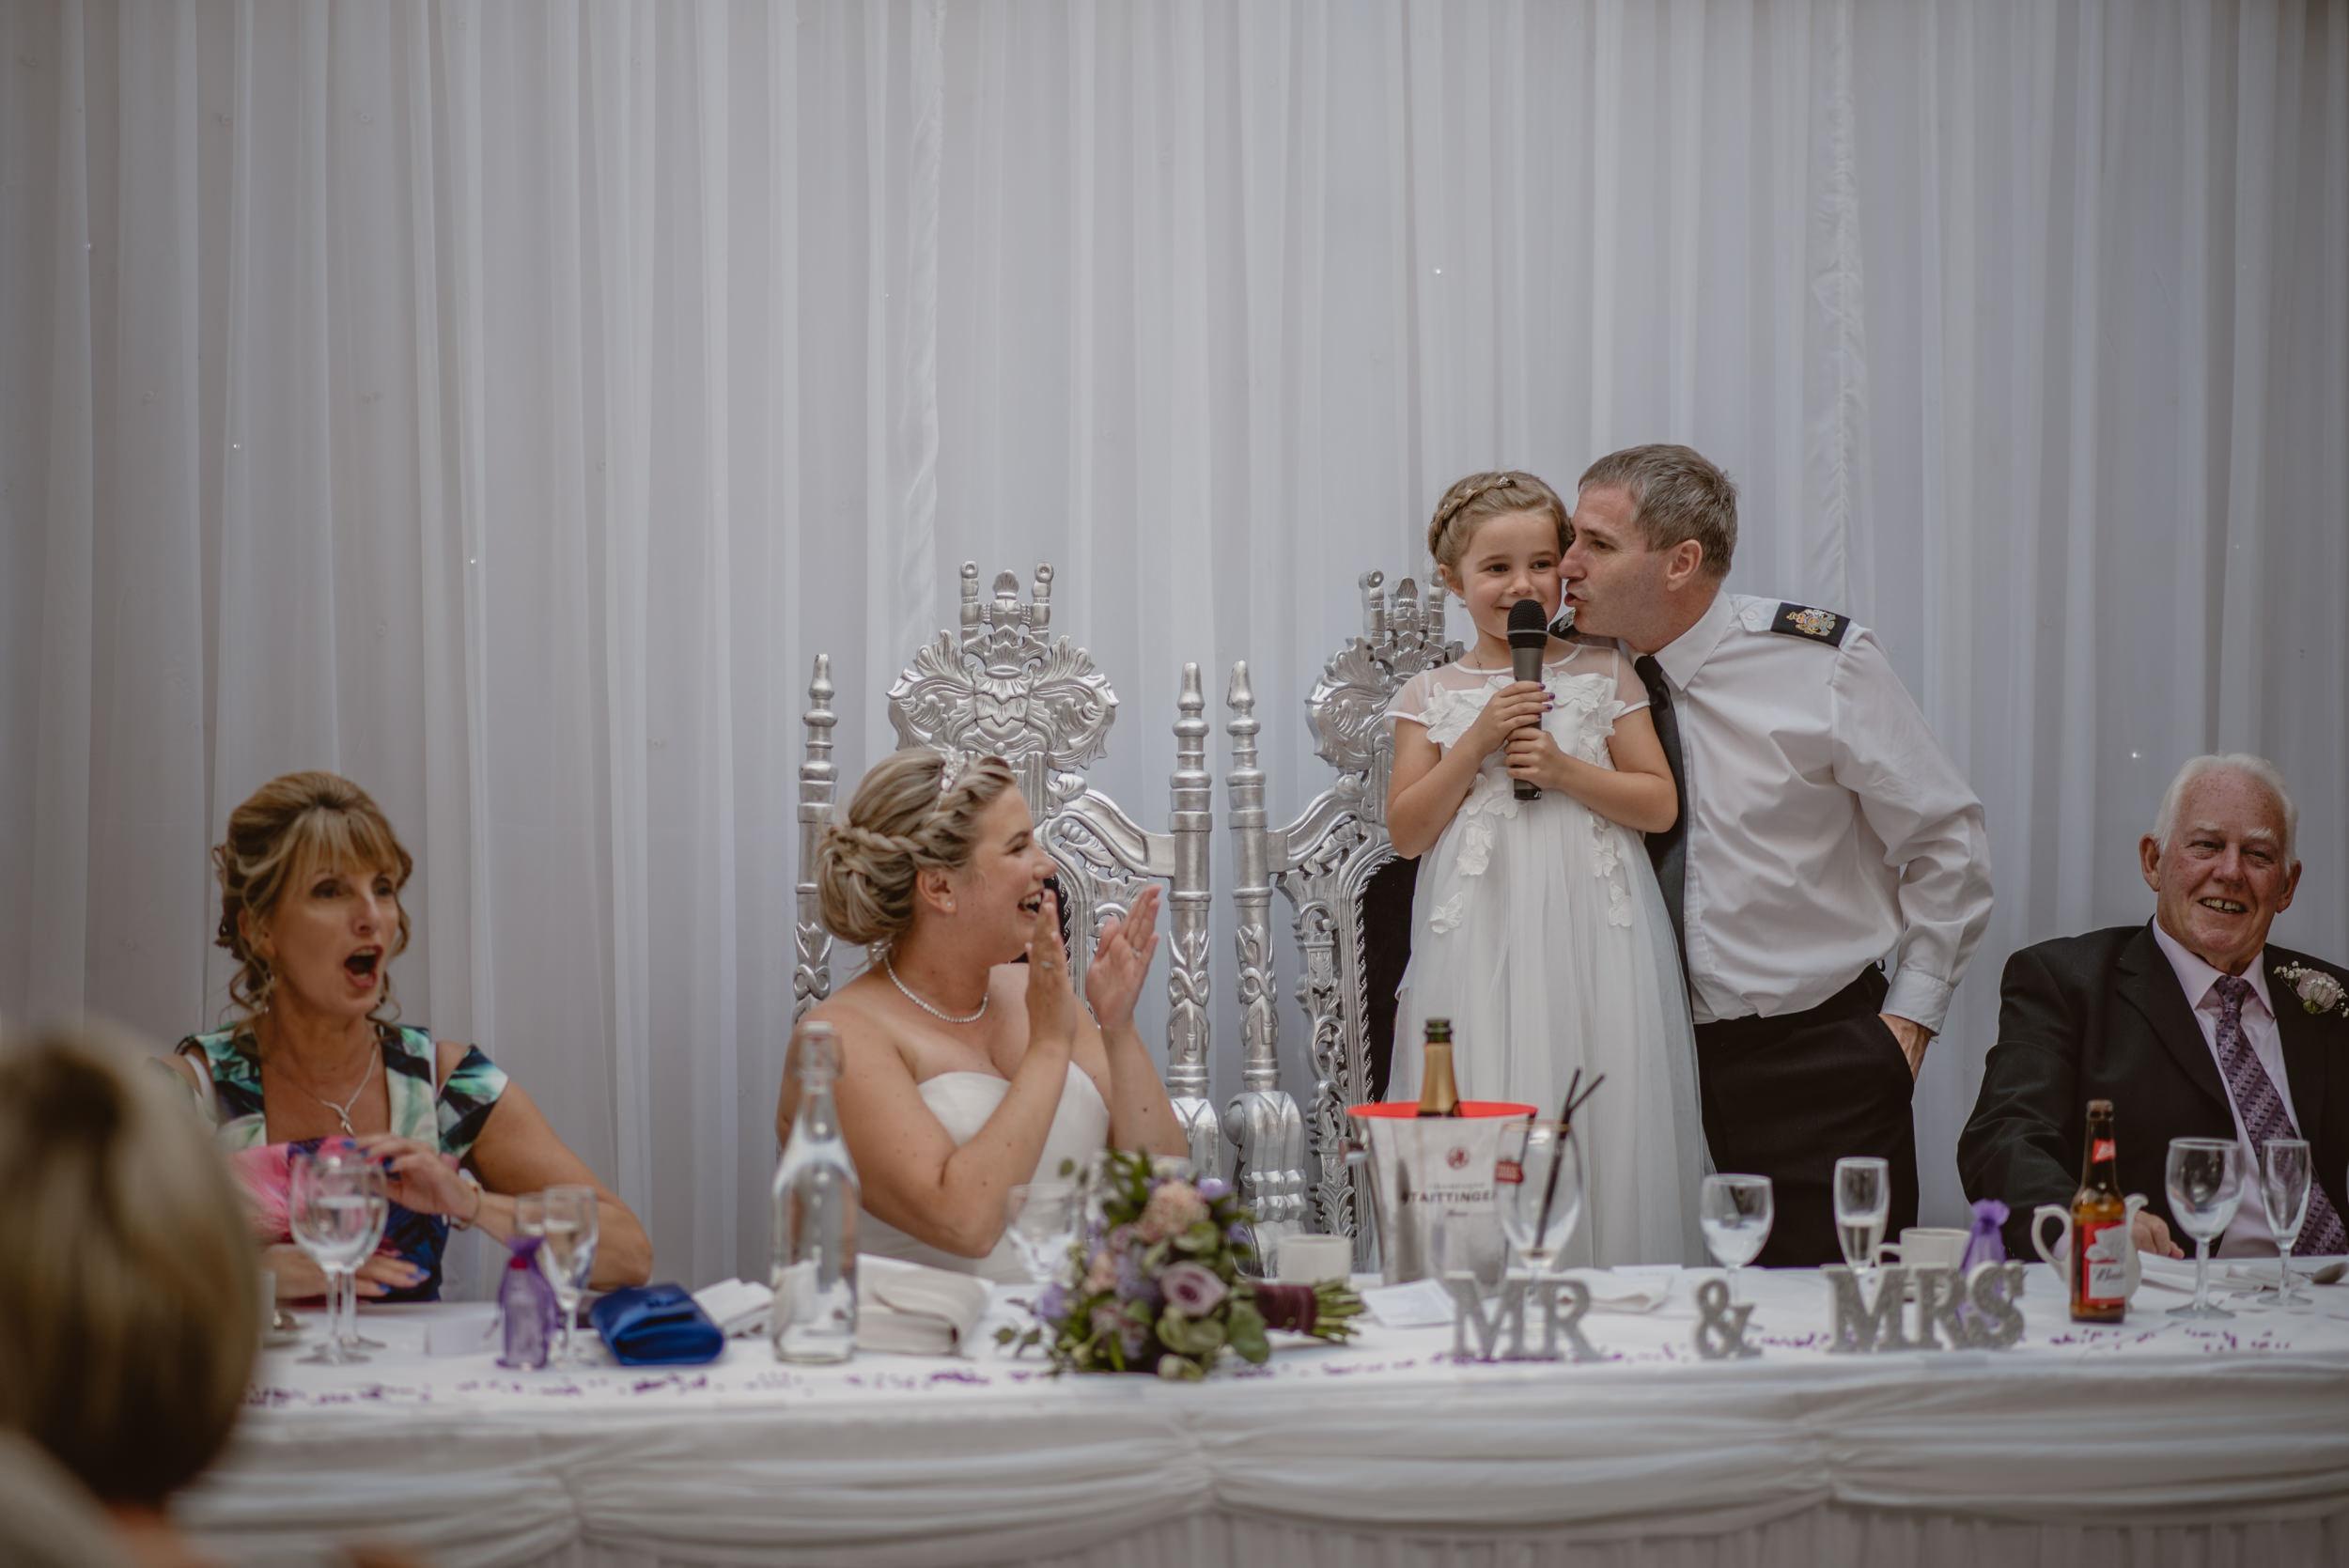 Chantelle-and-Stephen-Old-Thorns-Hotel-Wedding-Liphook-Manu-Mendoza-Wedding-Photography-435.jpg